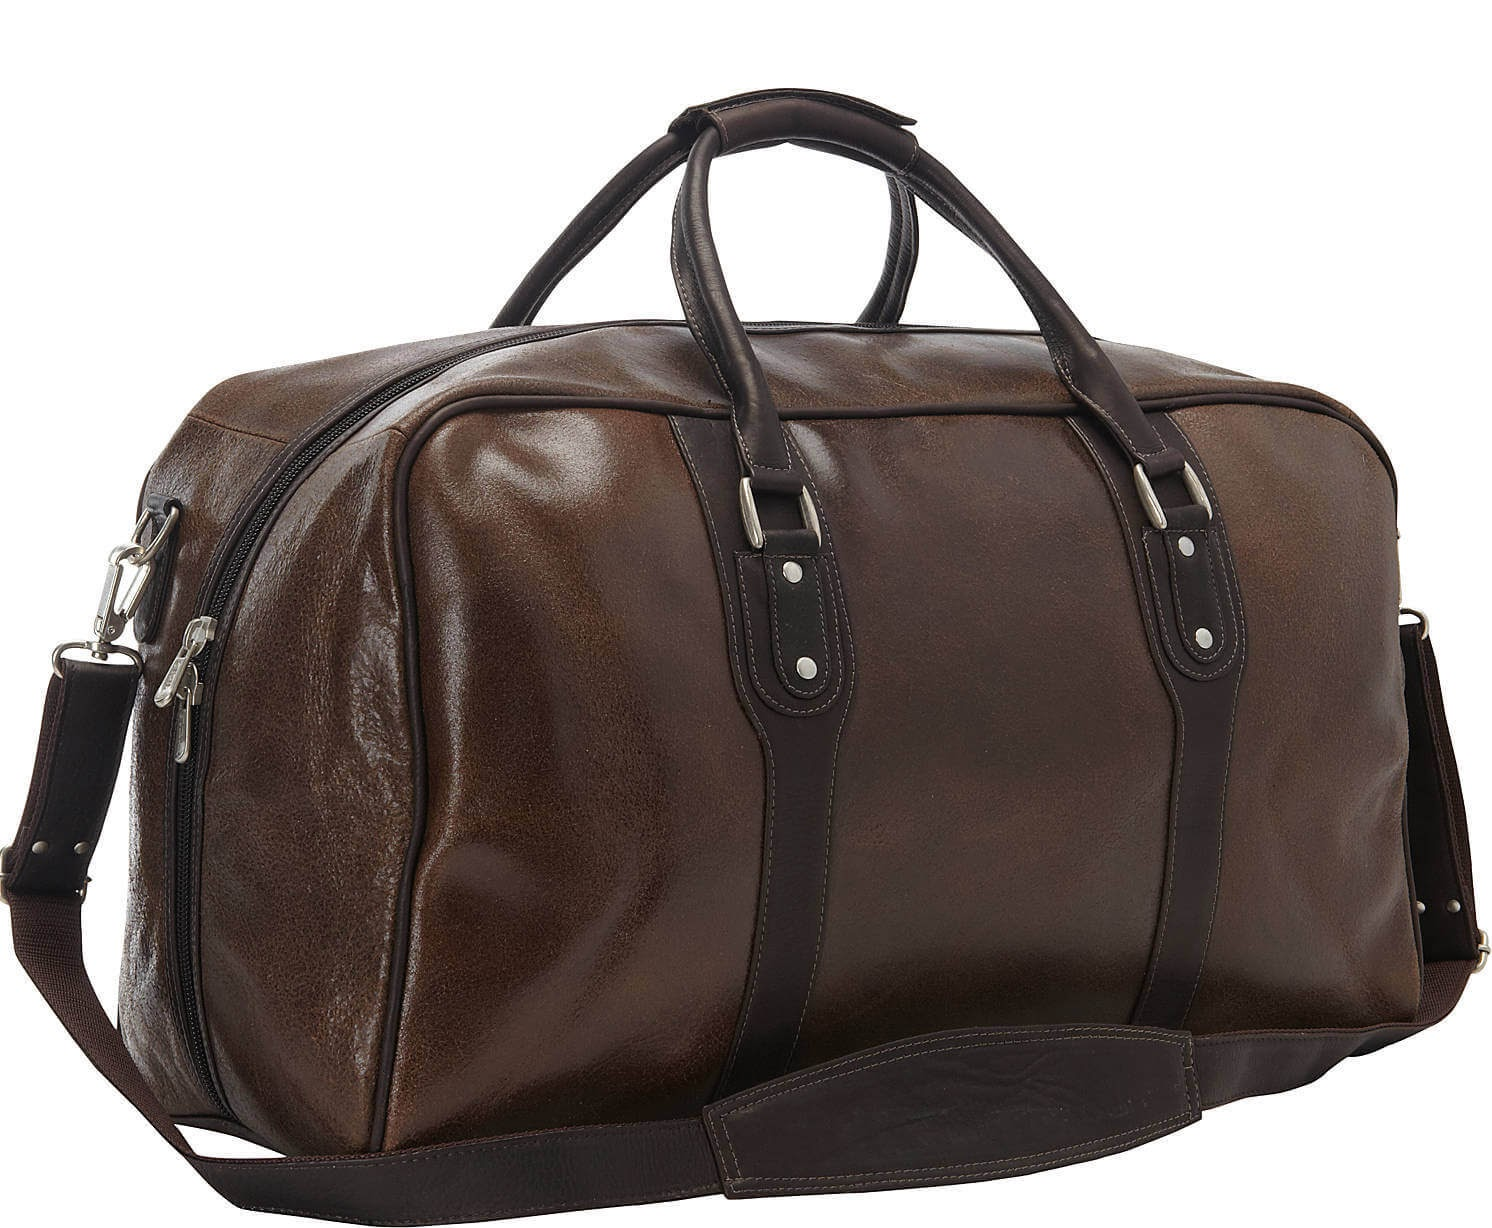 Bugatti Perreira Duffle Bag Leather